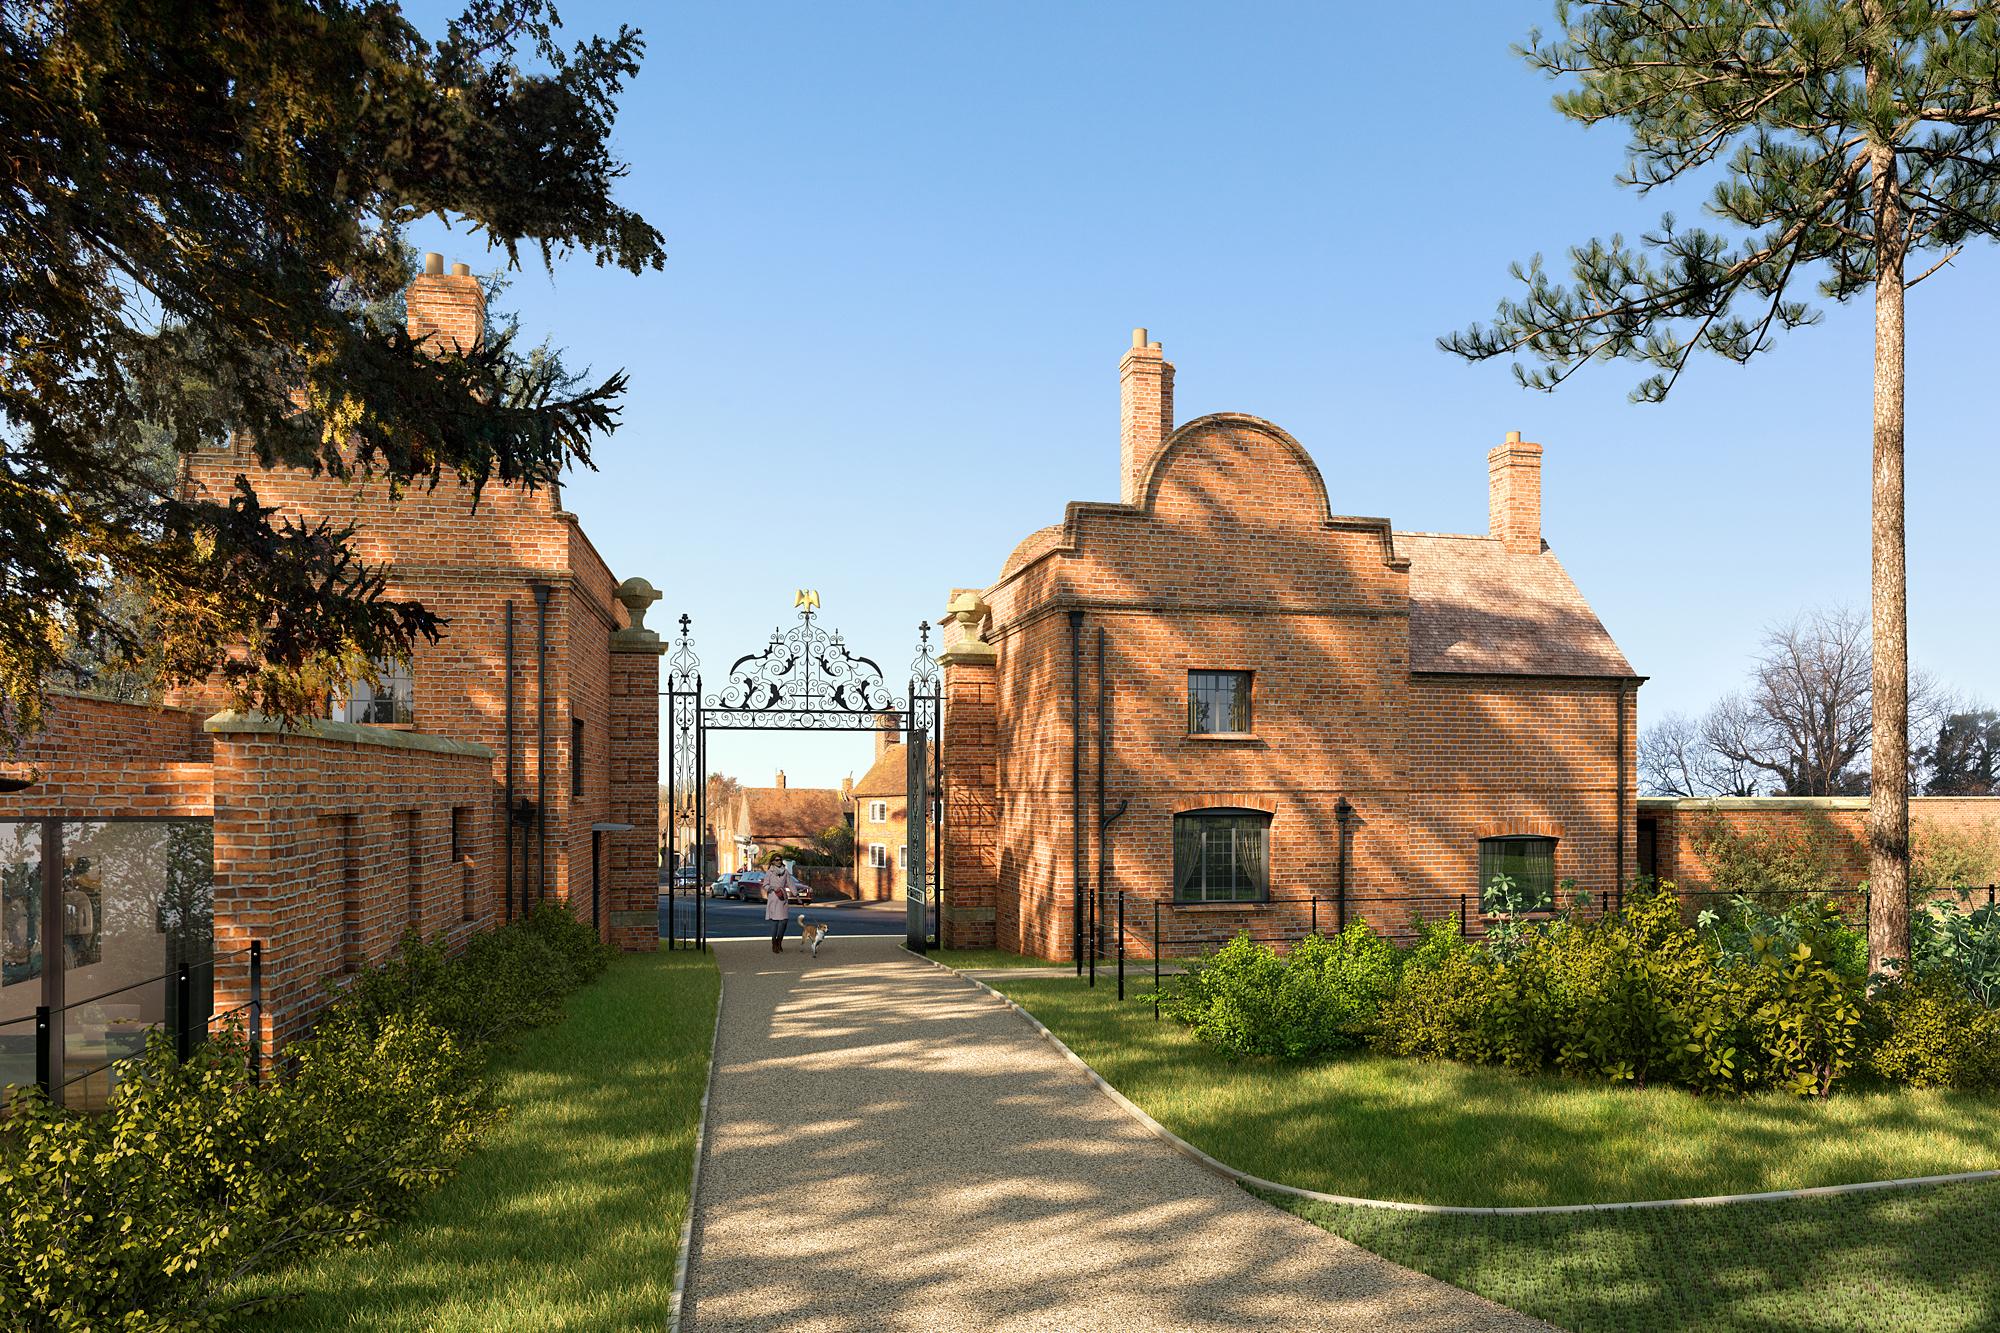 Aldermaston-historic-architectural-visualisation-photomontage-04.jpg